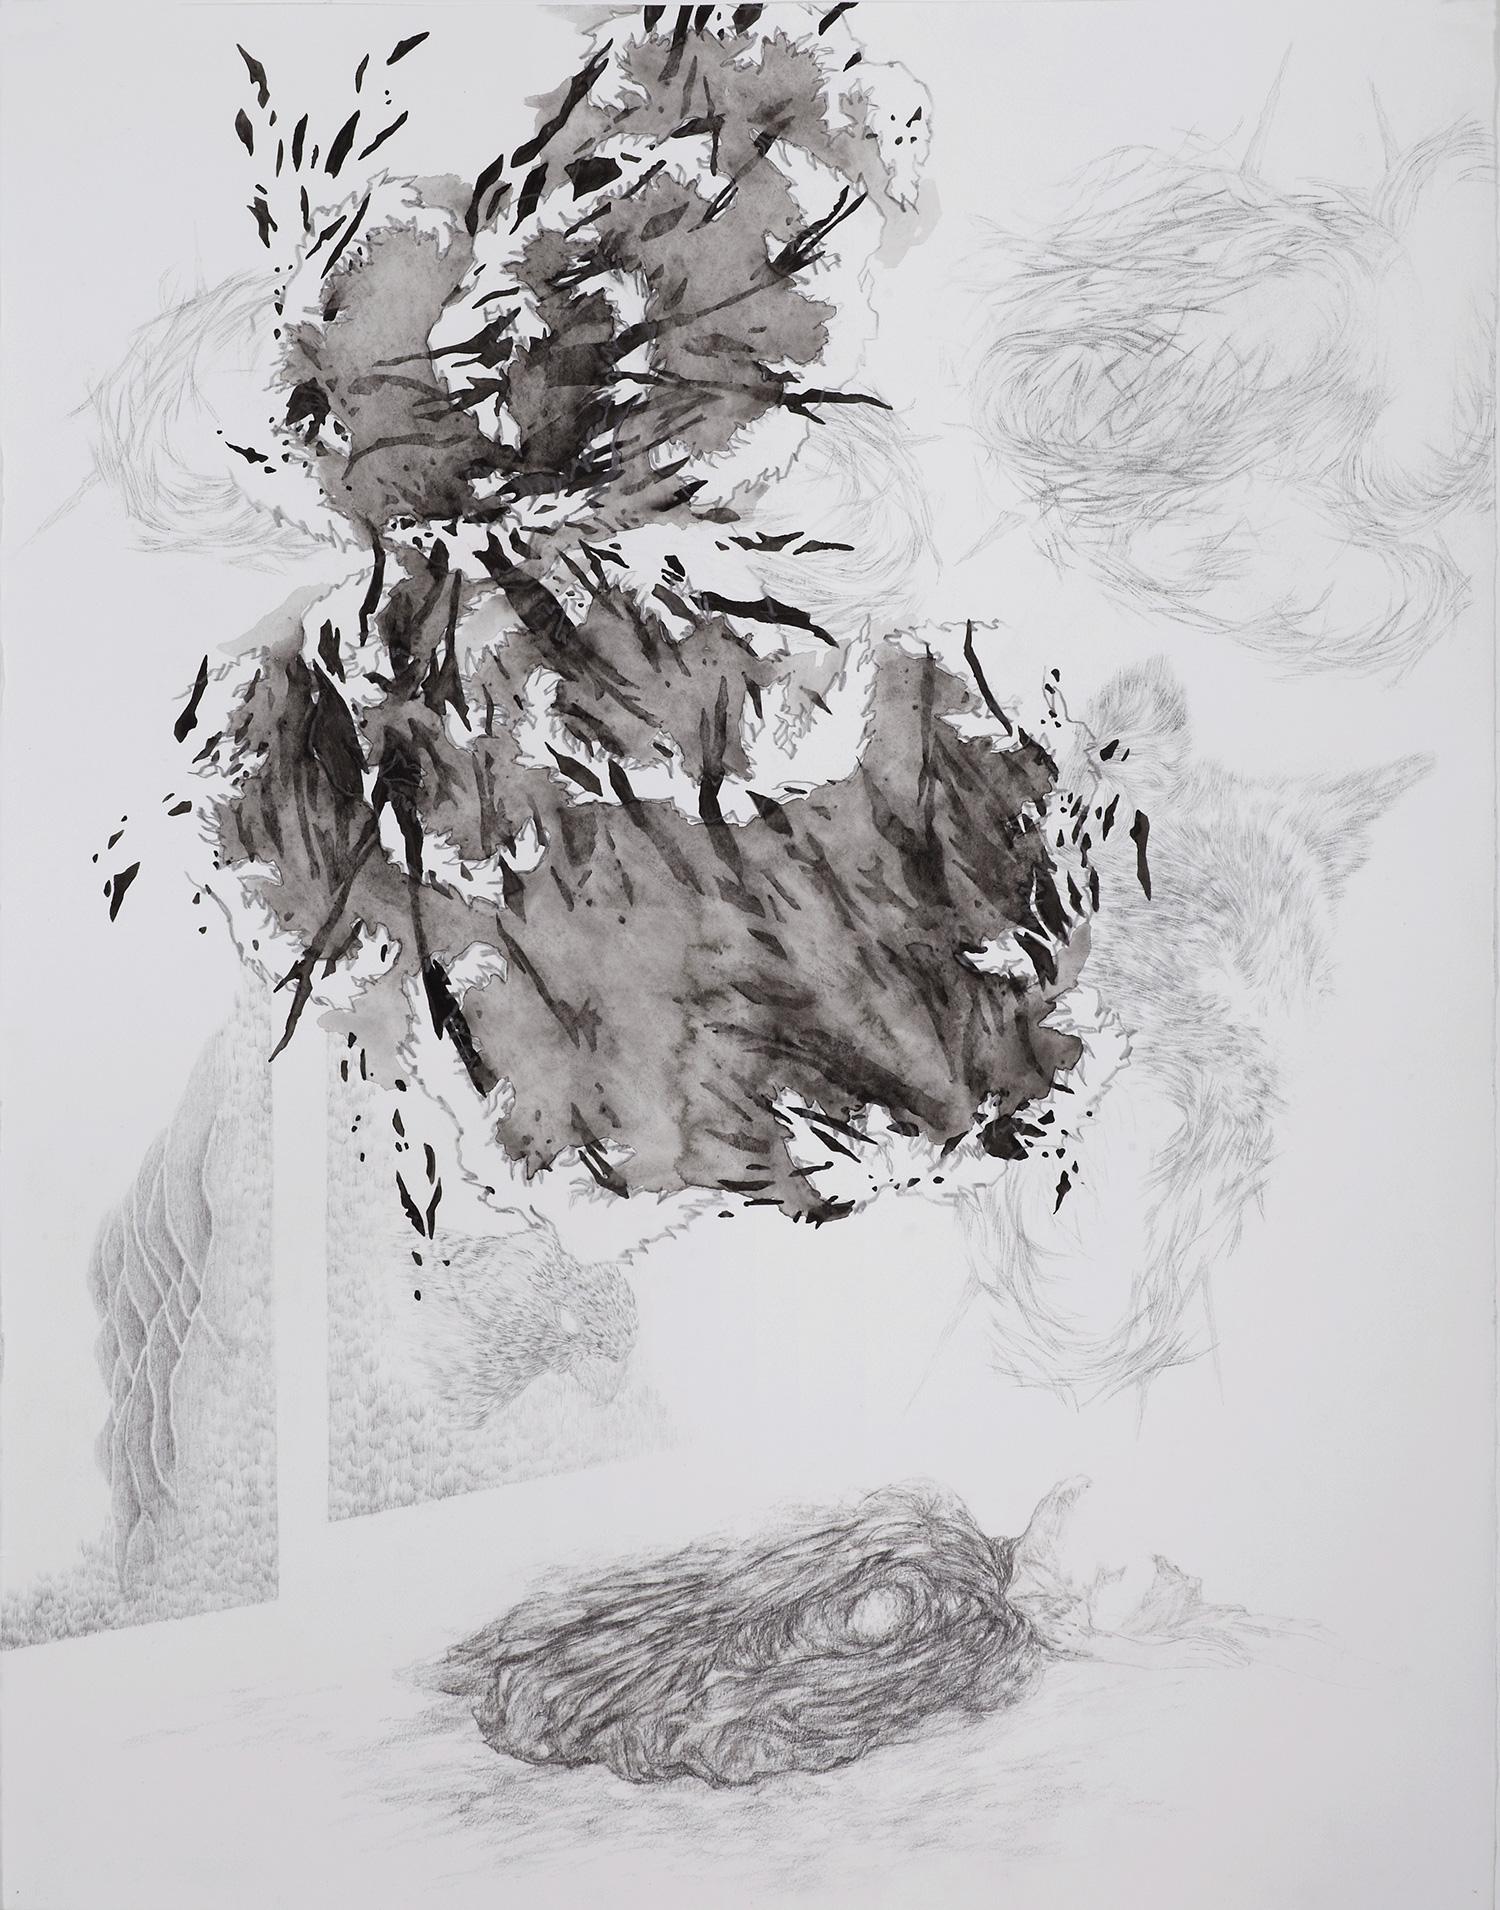 <i>Nids de la robe</i>, 2014, graphite et lavis, 80x60cm